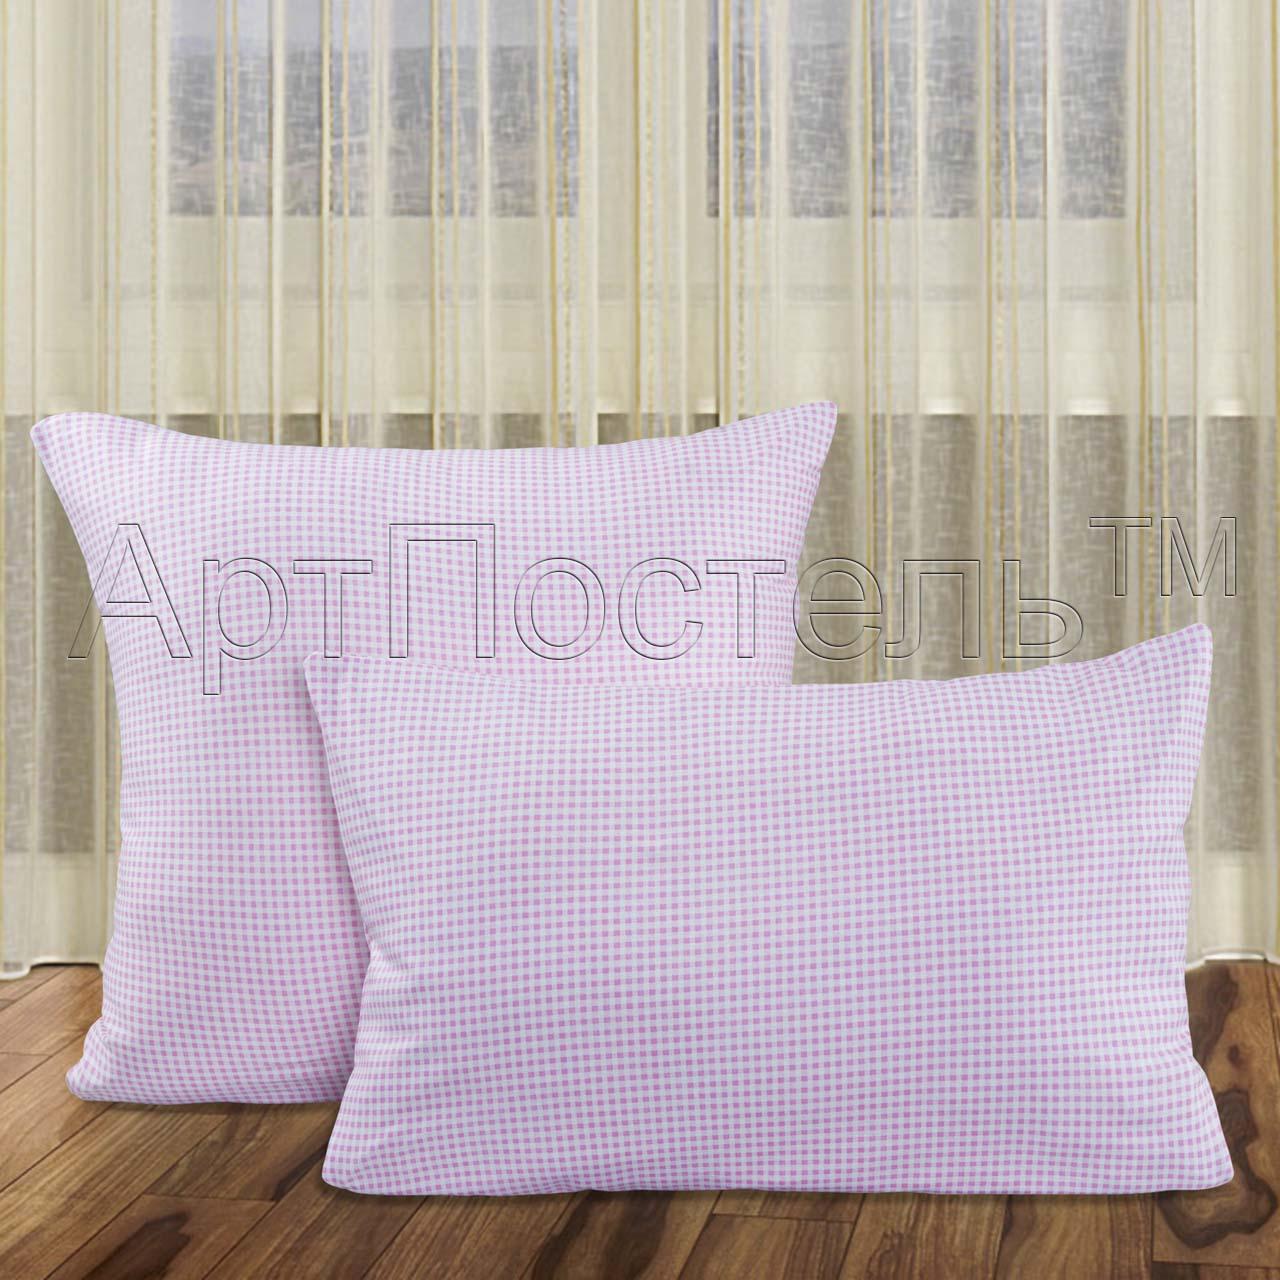 Наволочки Клетка Розовый, размер 70х70 смНаволочки<br>Плотность ткани: 140 г/кв. м <br>Количество: 2 шт.<br><br>Тип: Наволочки<br>Размер: 70х70<br>Материал: Кулирка